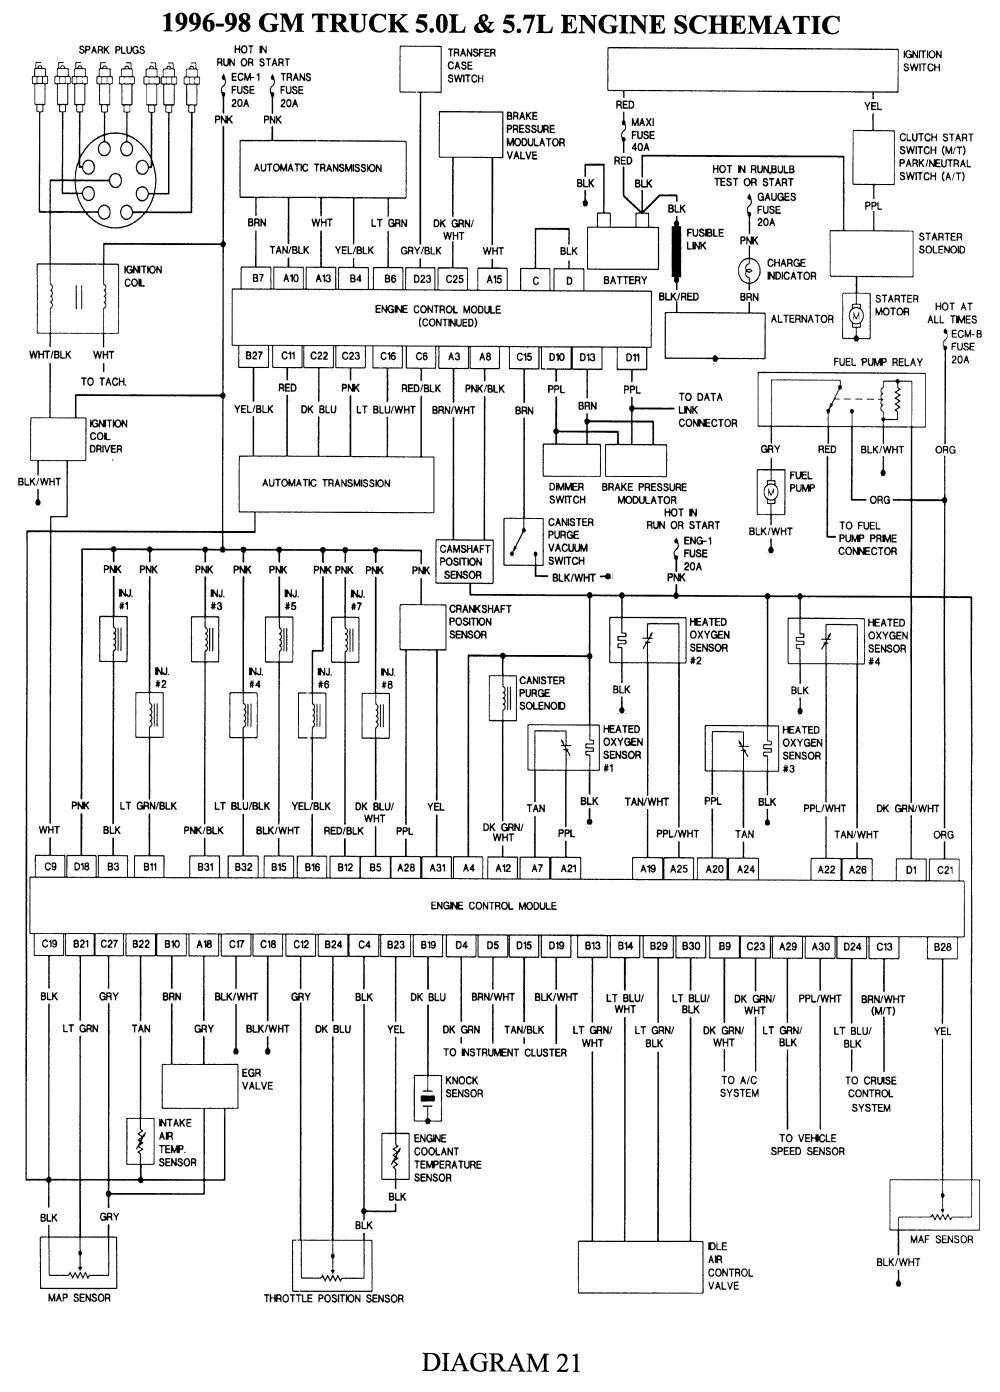 1996 chevy monte carlo wiring diagram | wiring diagram 178 period  udiuomo